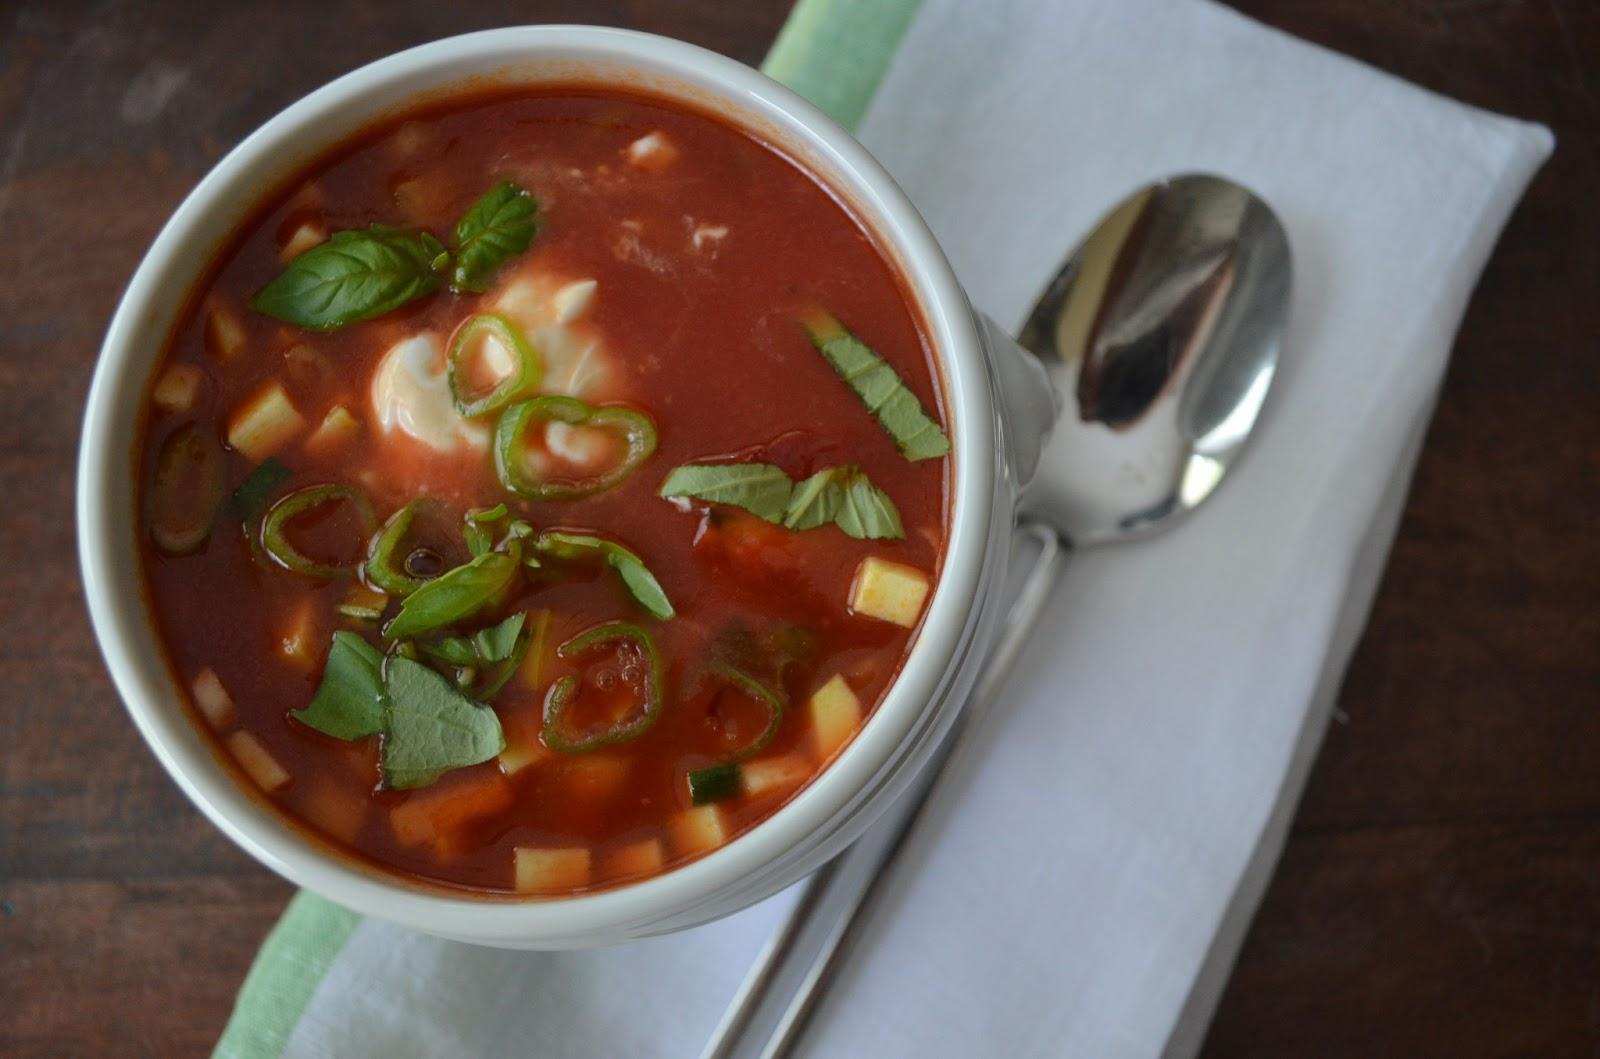 Cold Tomato Summer Vegetable Soup Recipes — Dishmaps